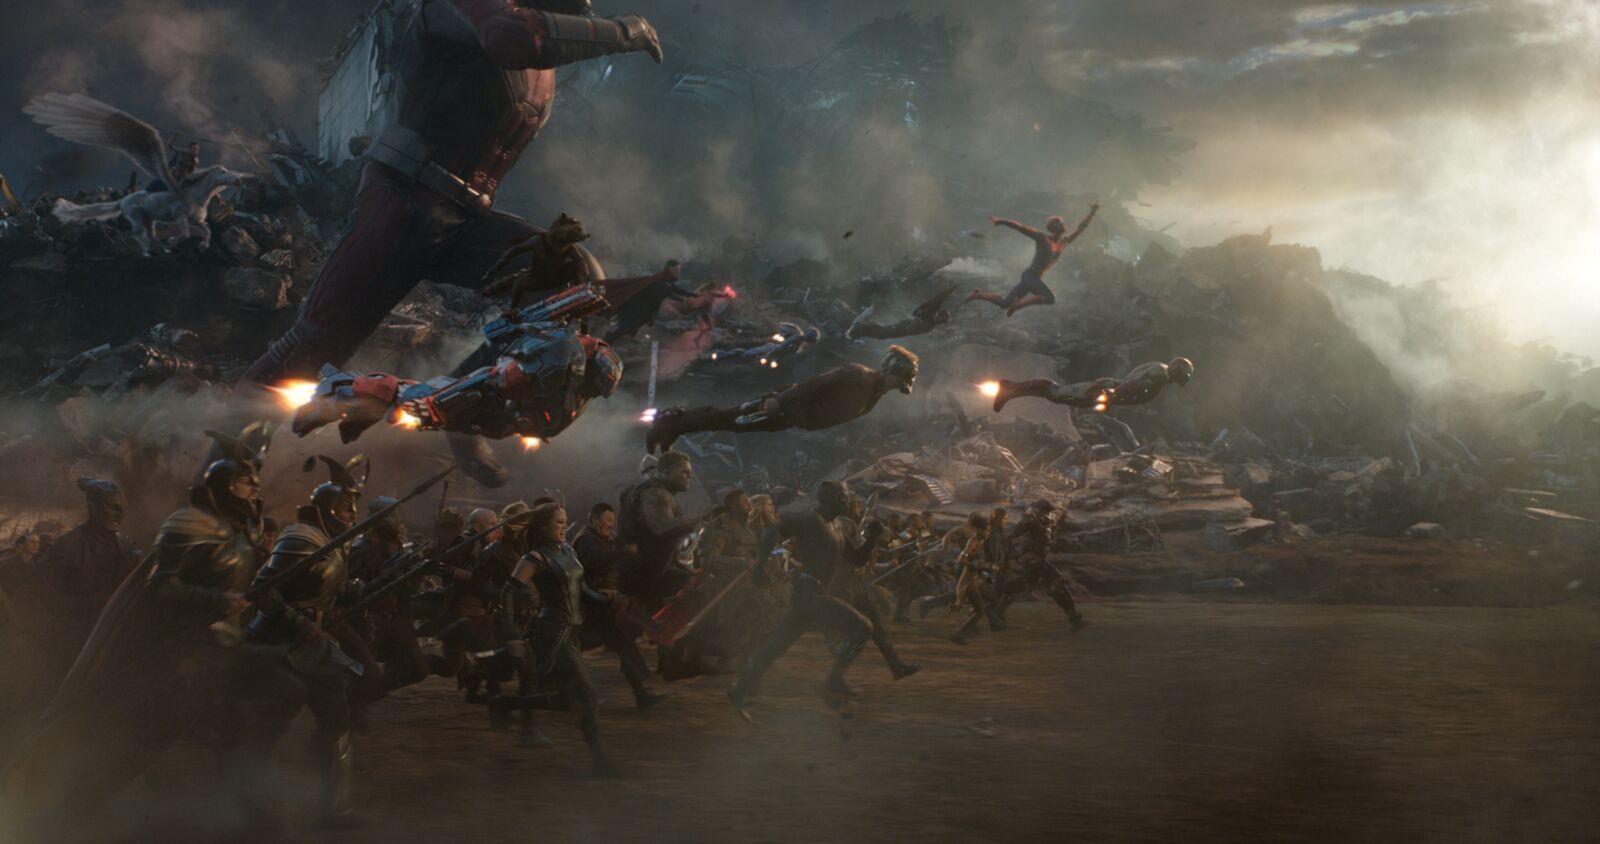 Avengers: Endgame – Sean Gunn reveals a scene cut from the final battle